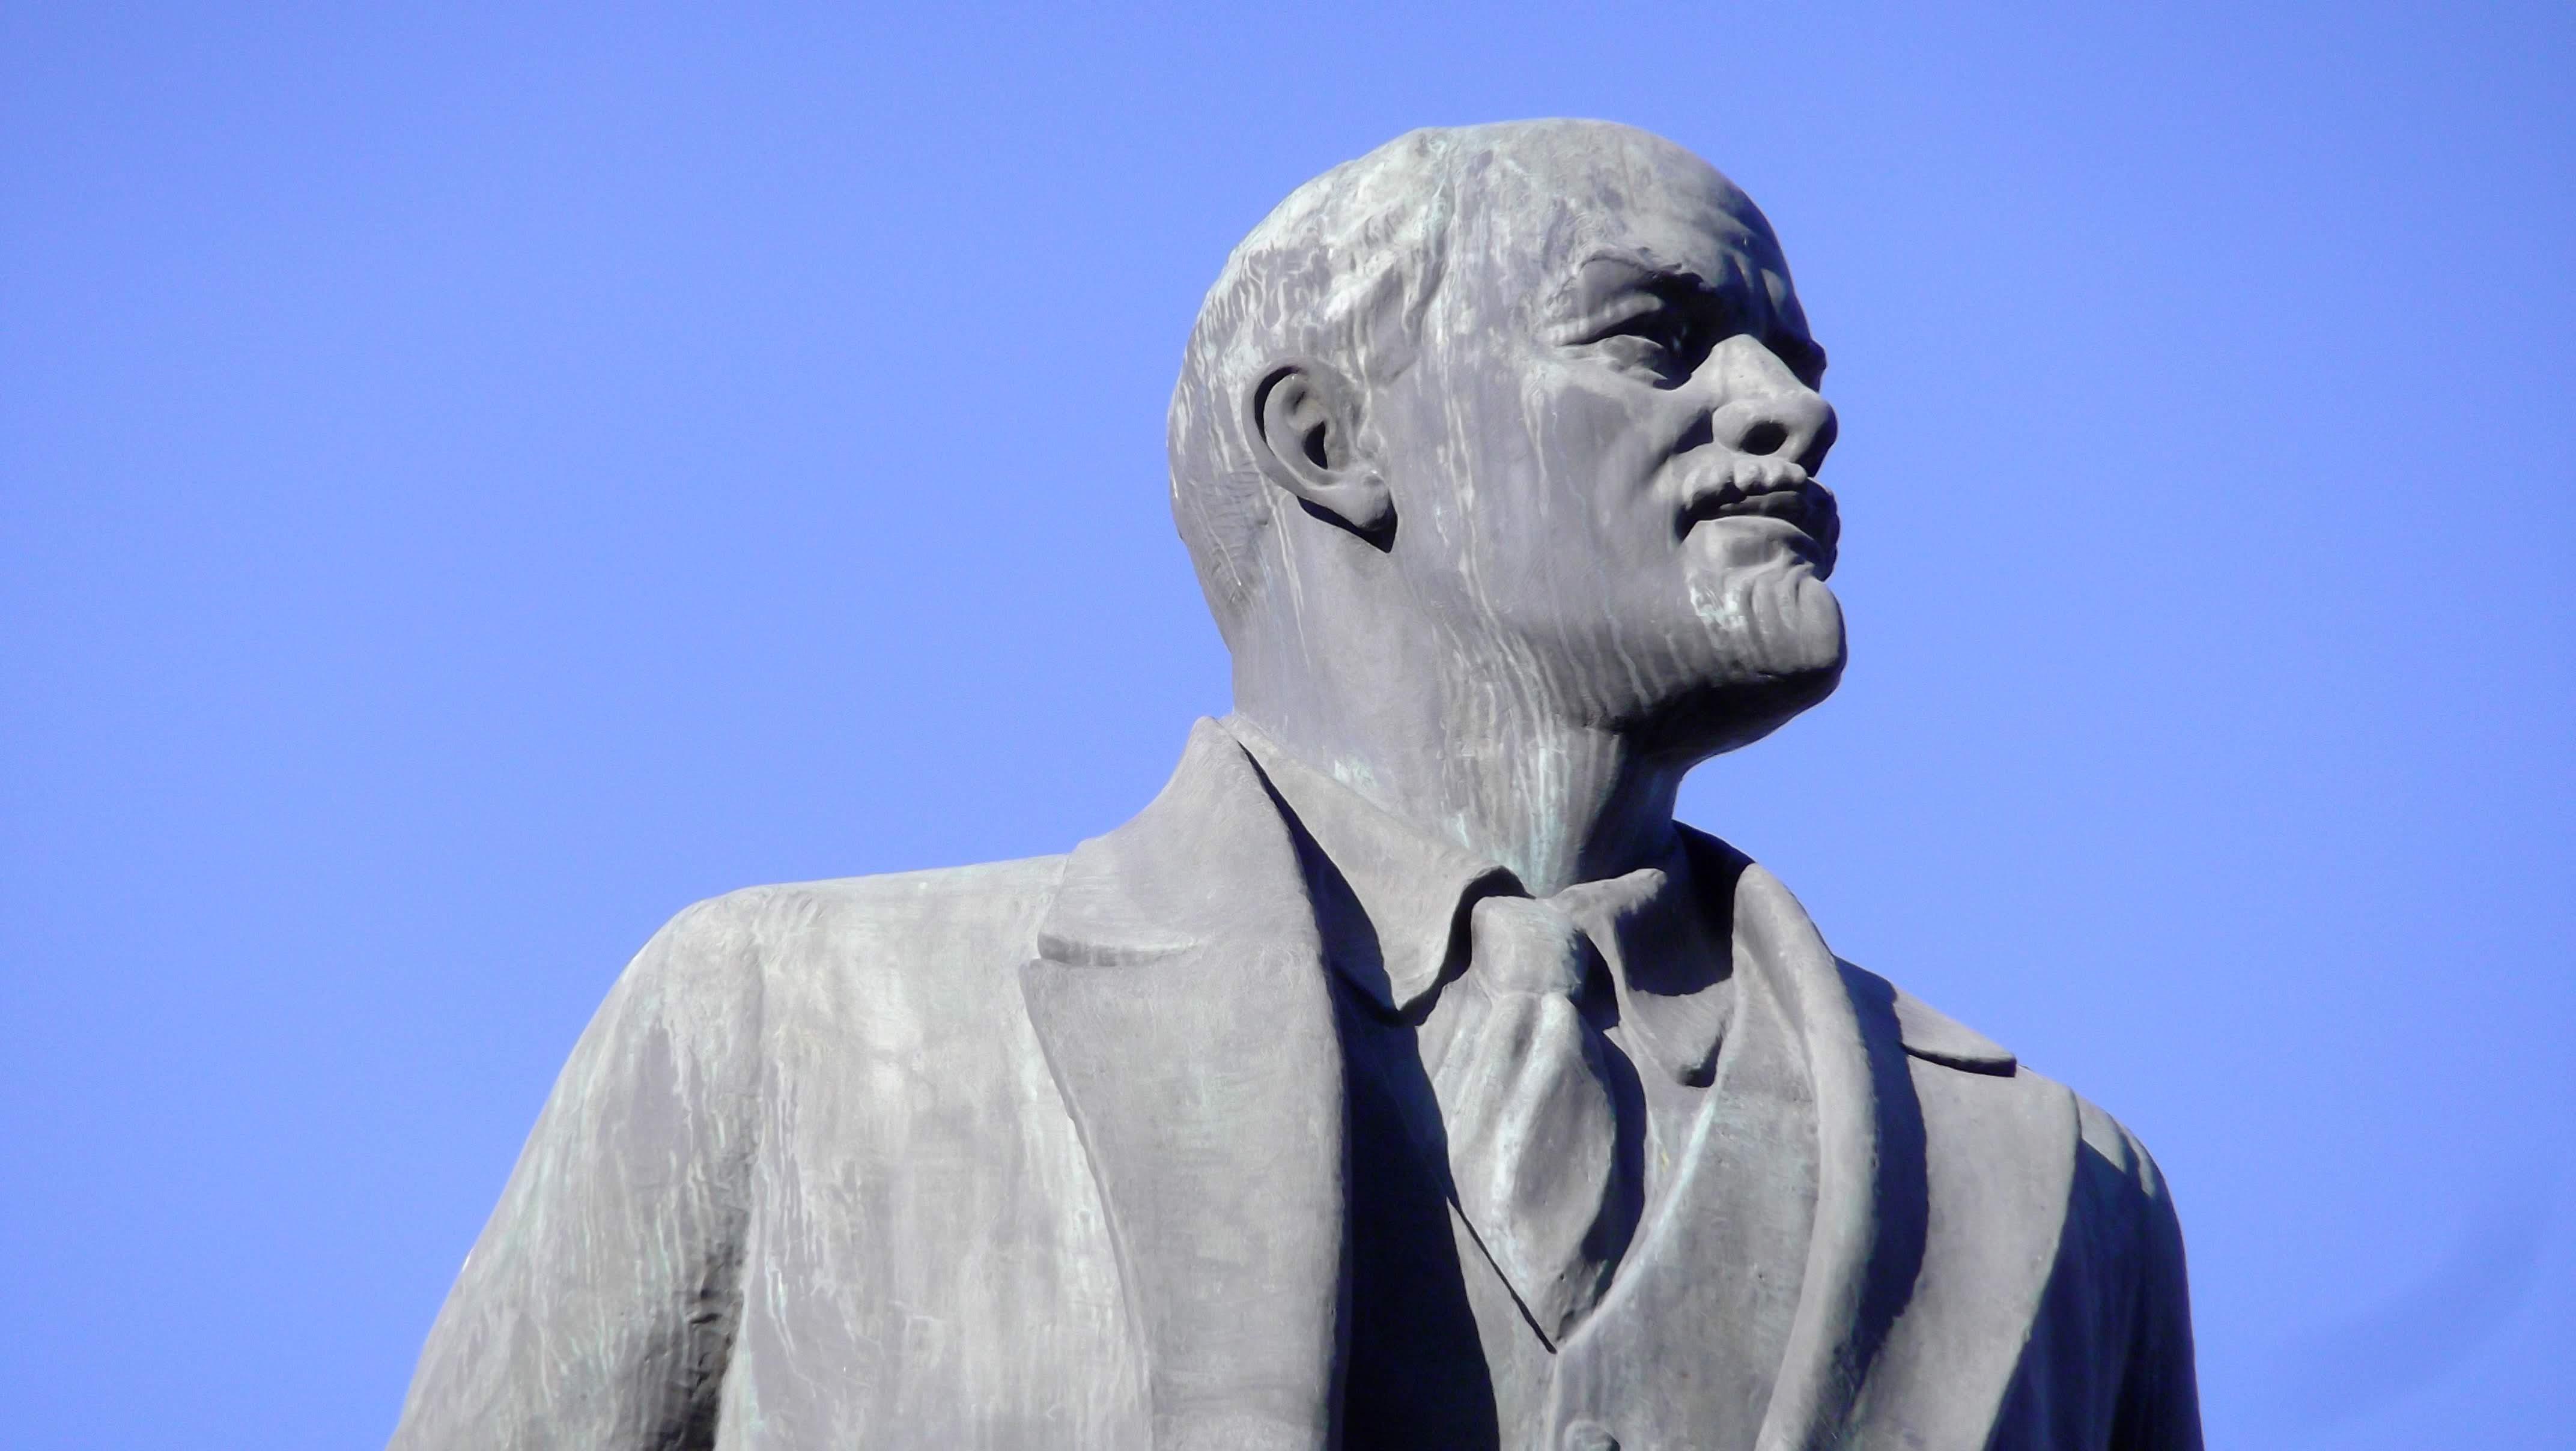 profile of man statue